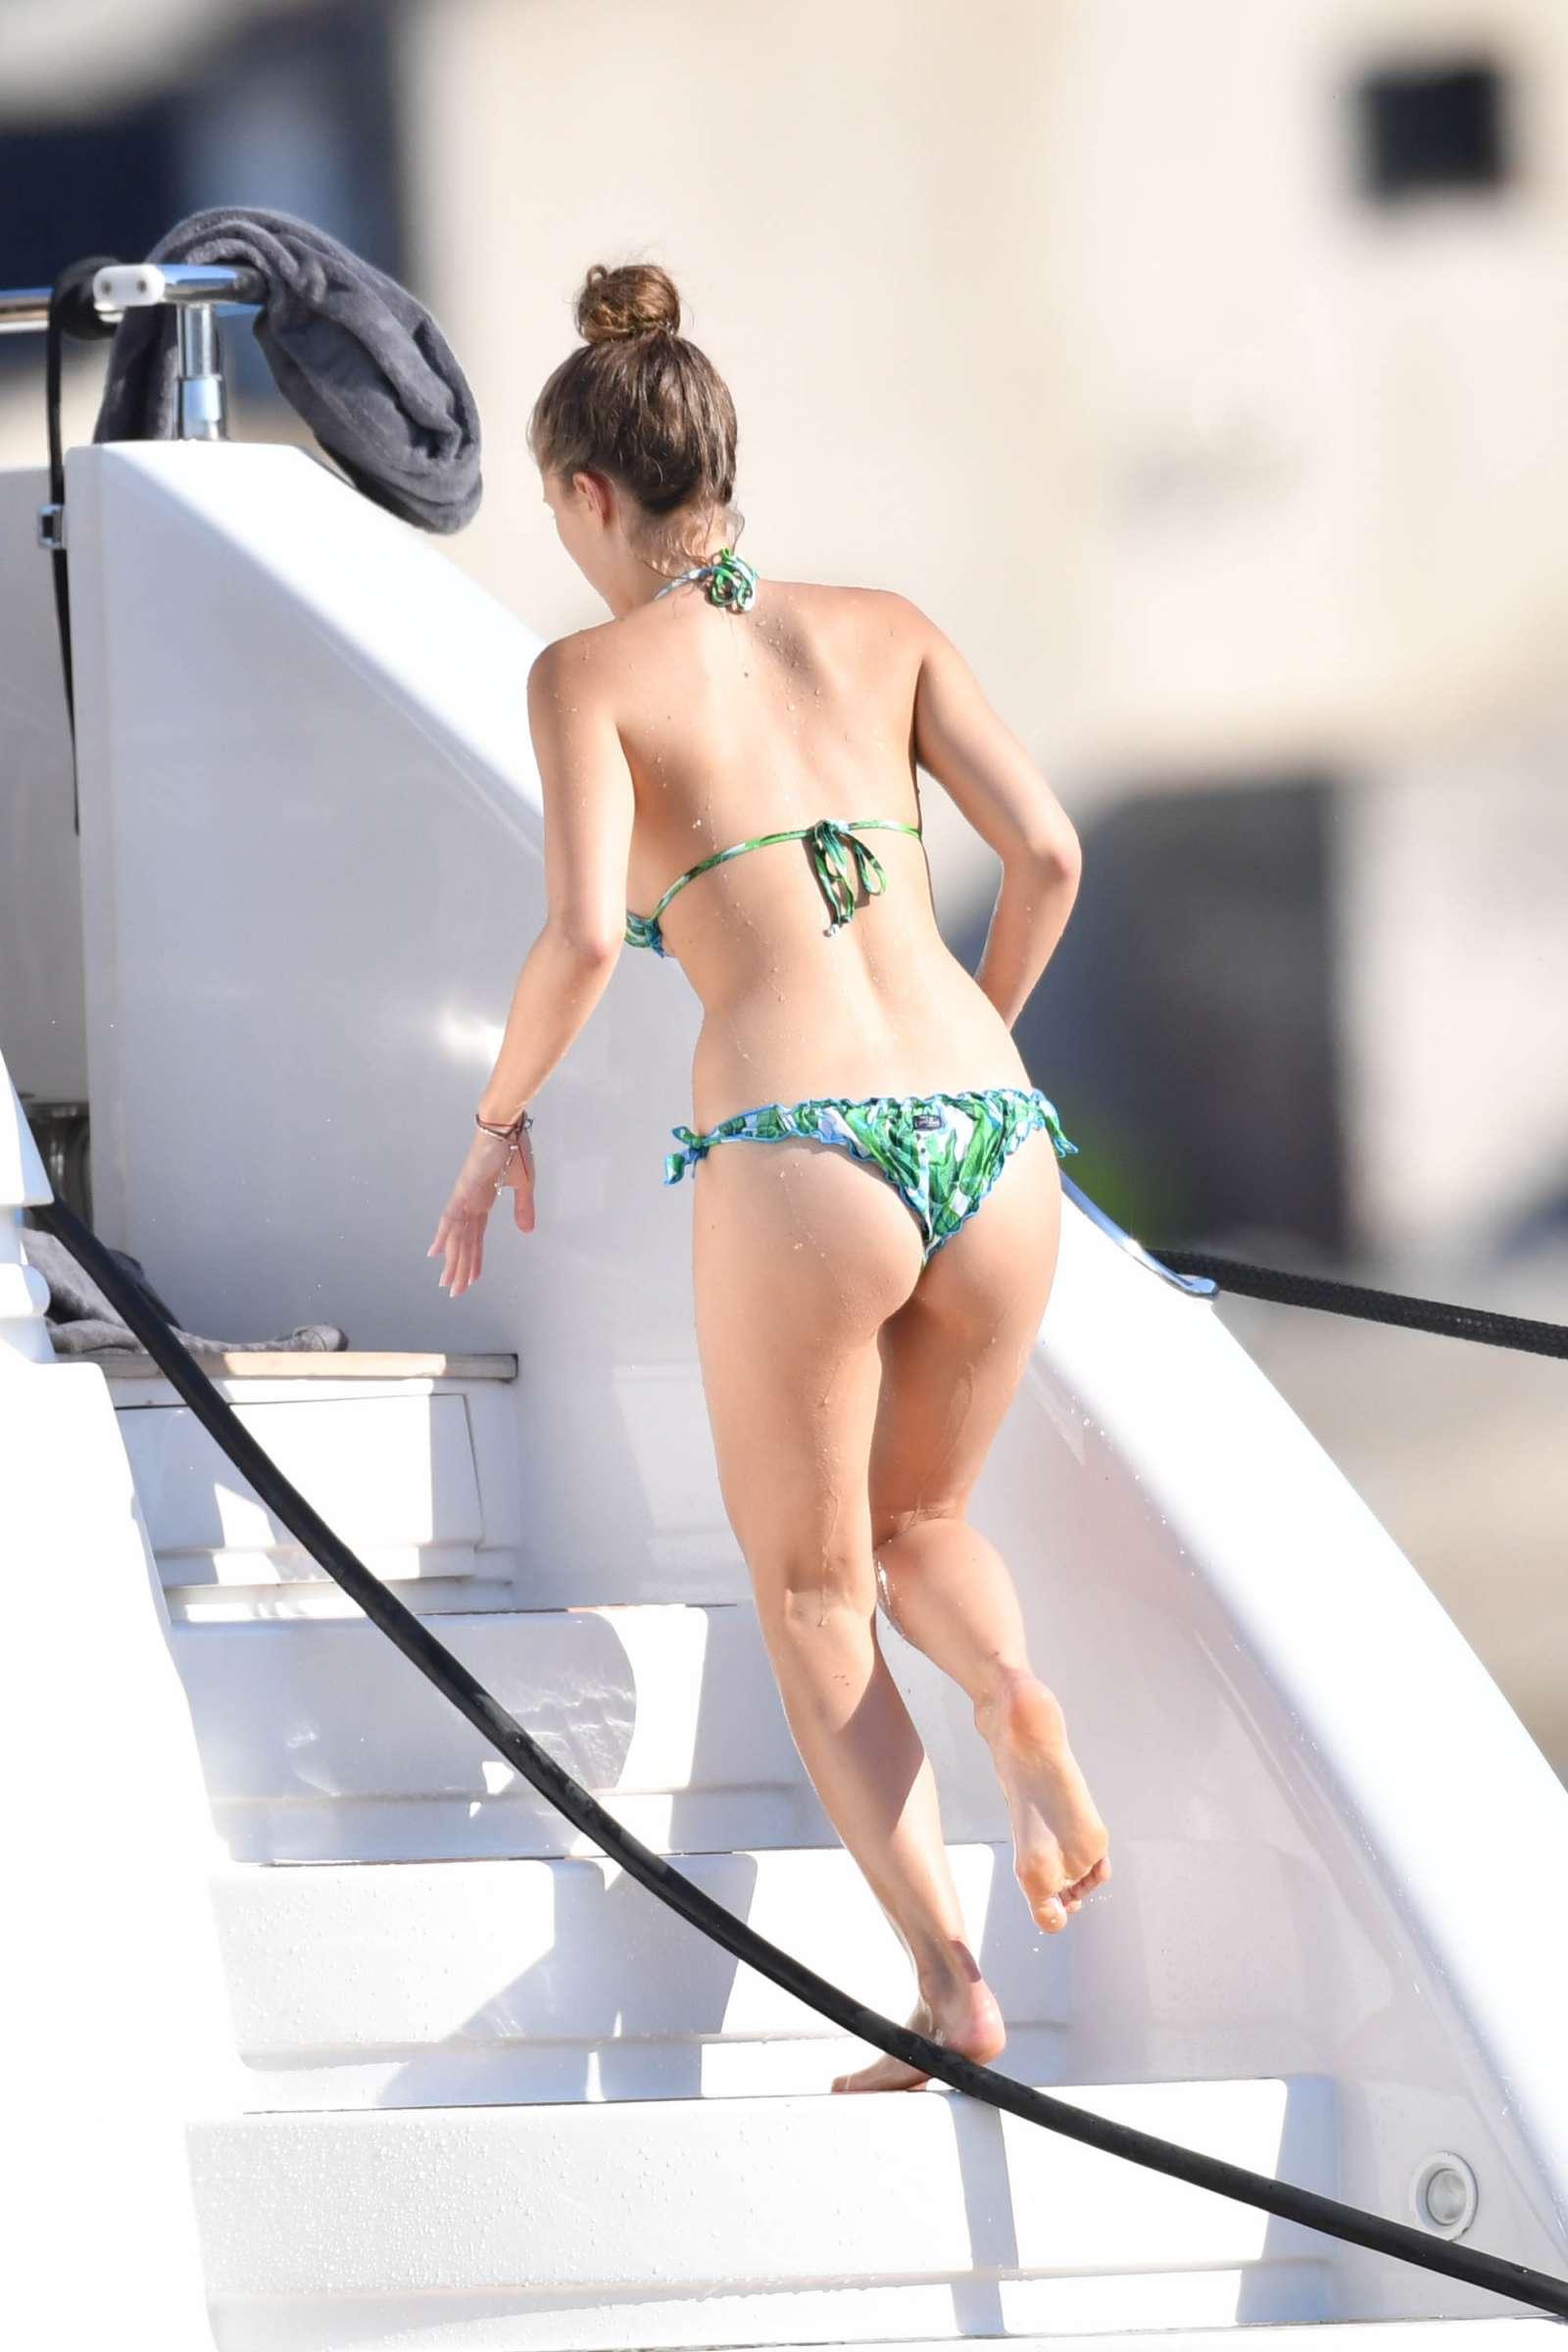 Victoria Swarovski 2017 : Victoria Swarovski in Bikini 2017 -18